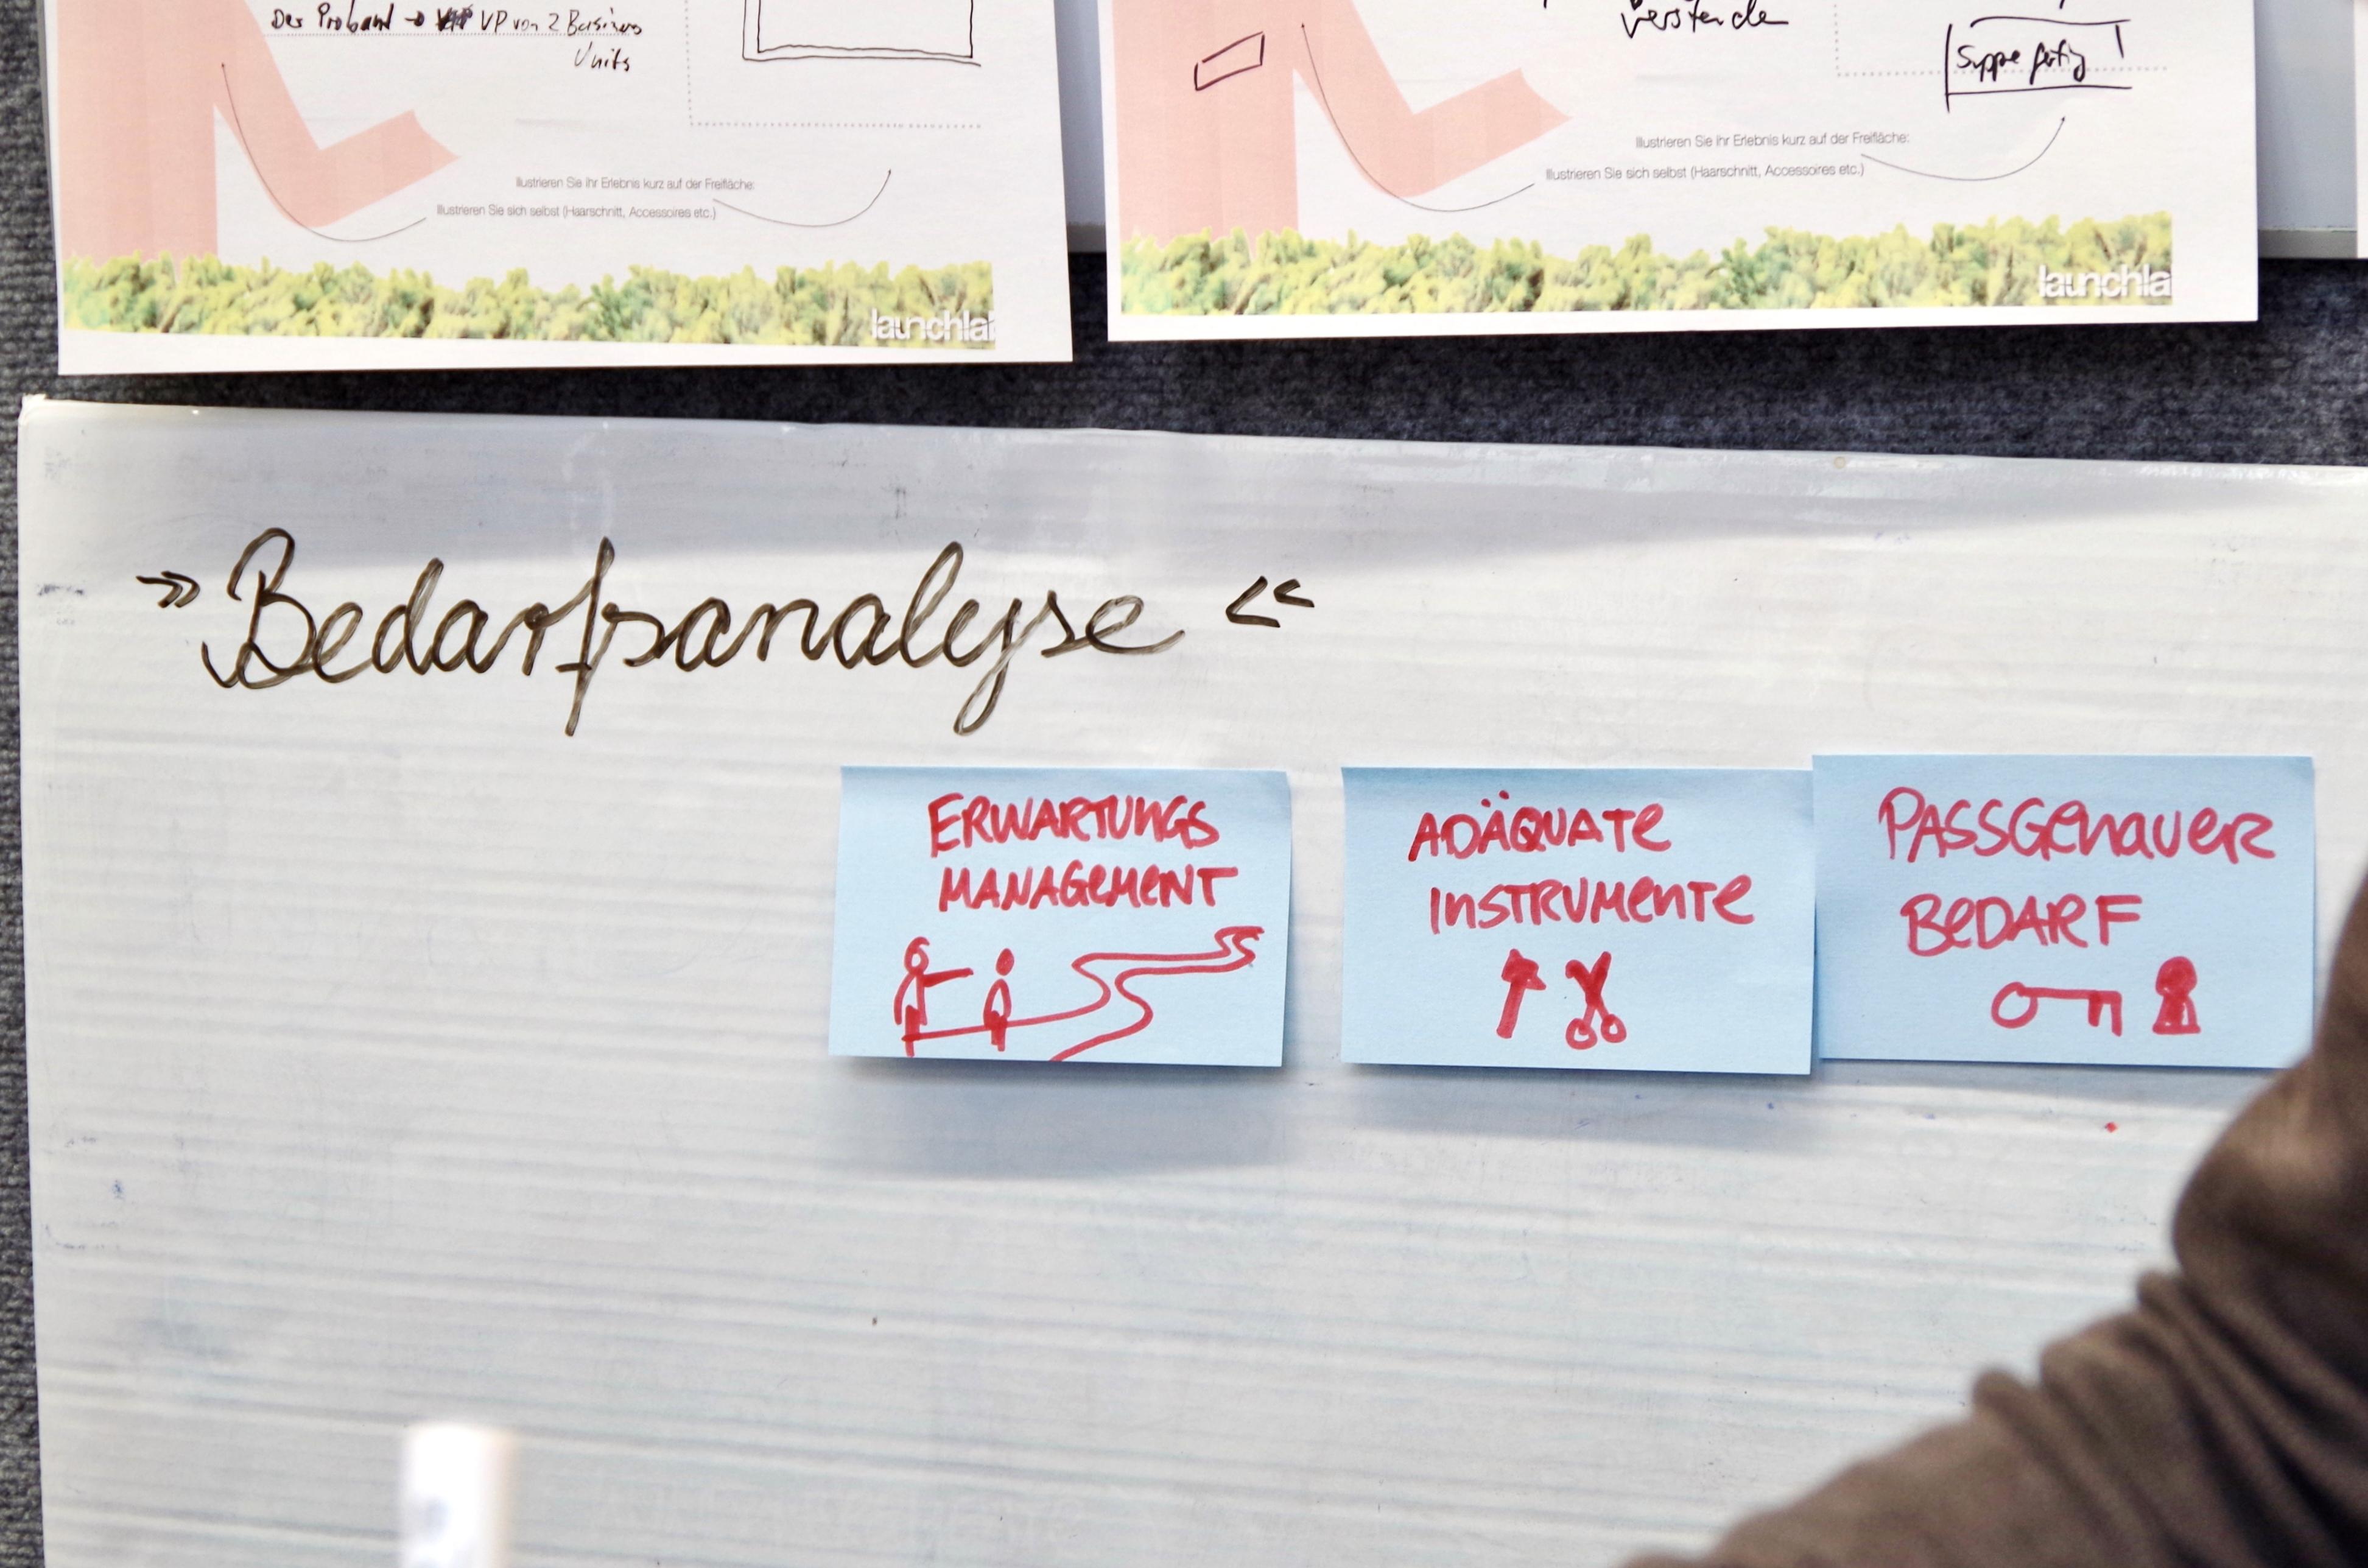 Atemberaubend Stakeholder Bedarfsanalyse Template Bilder - Bilder ...